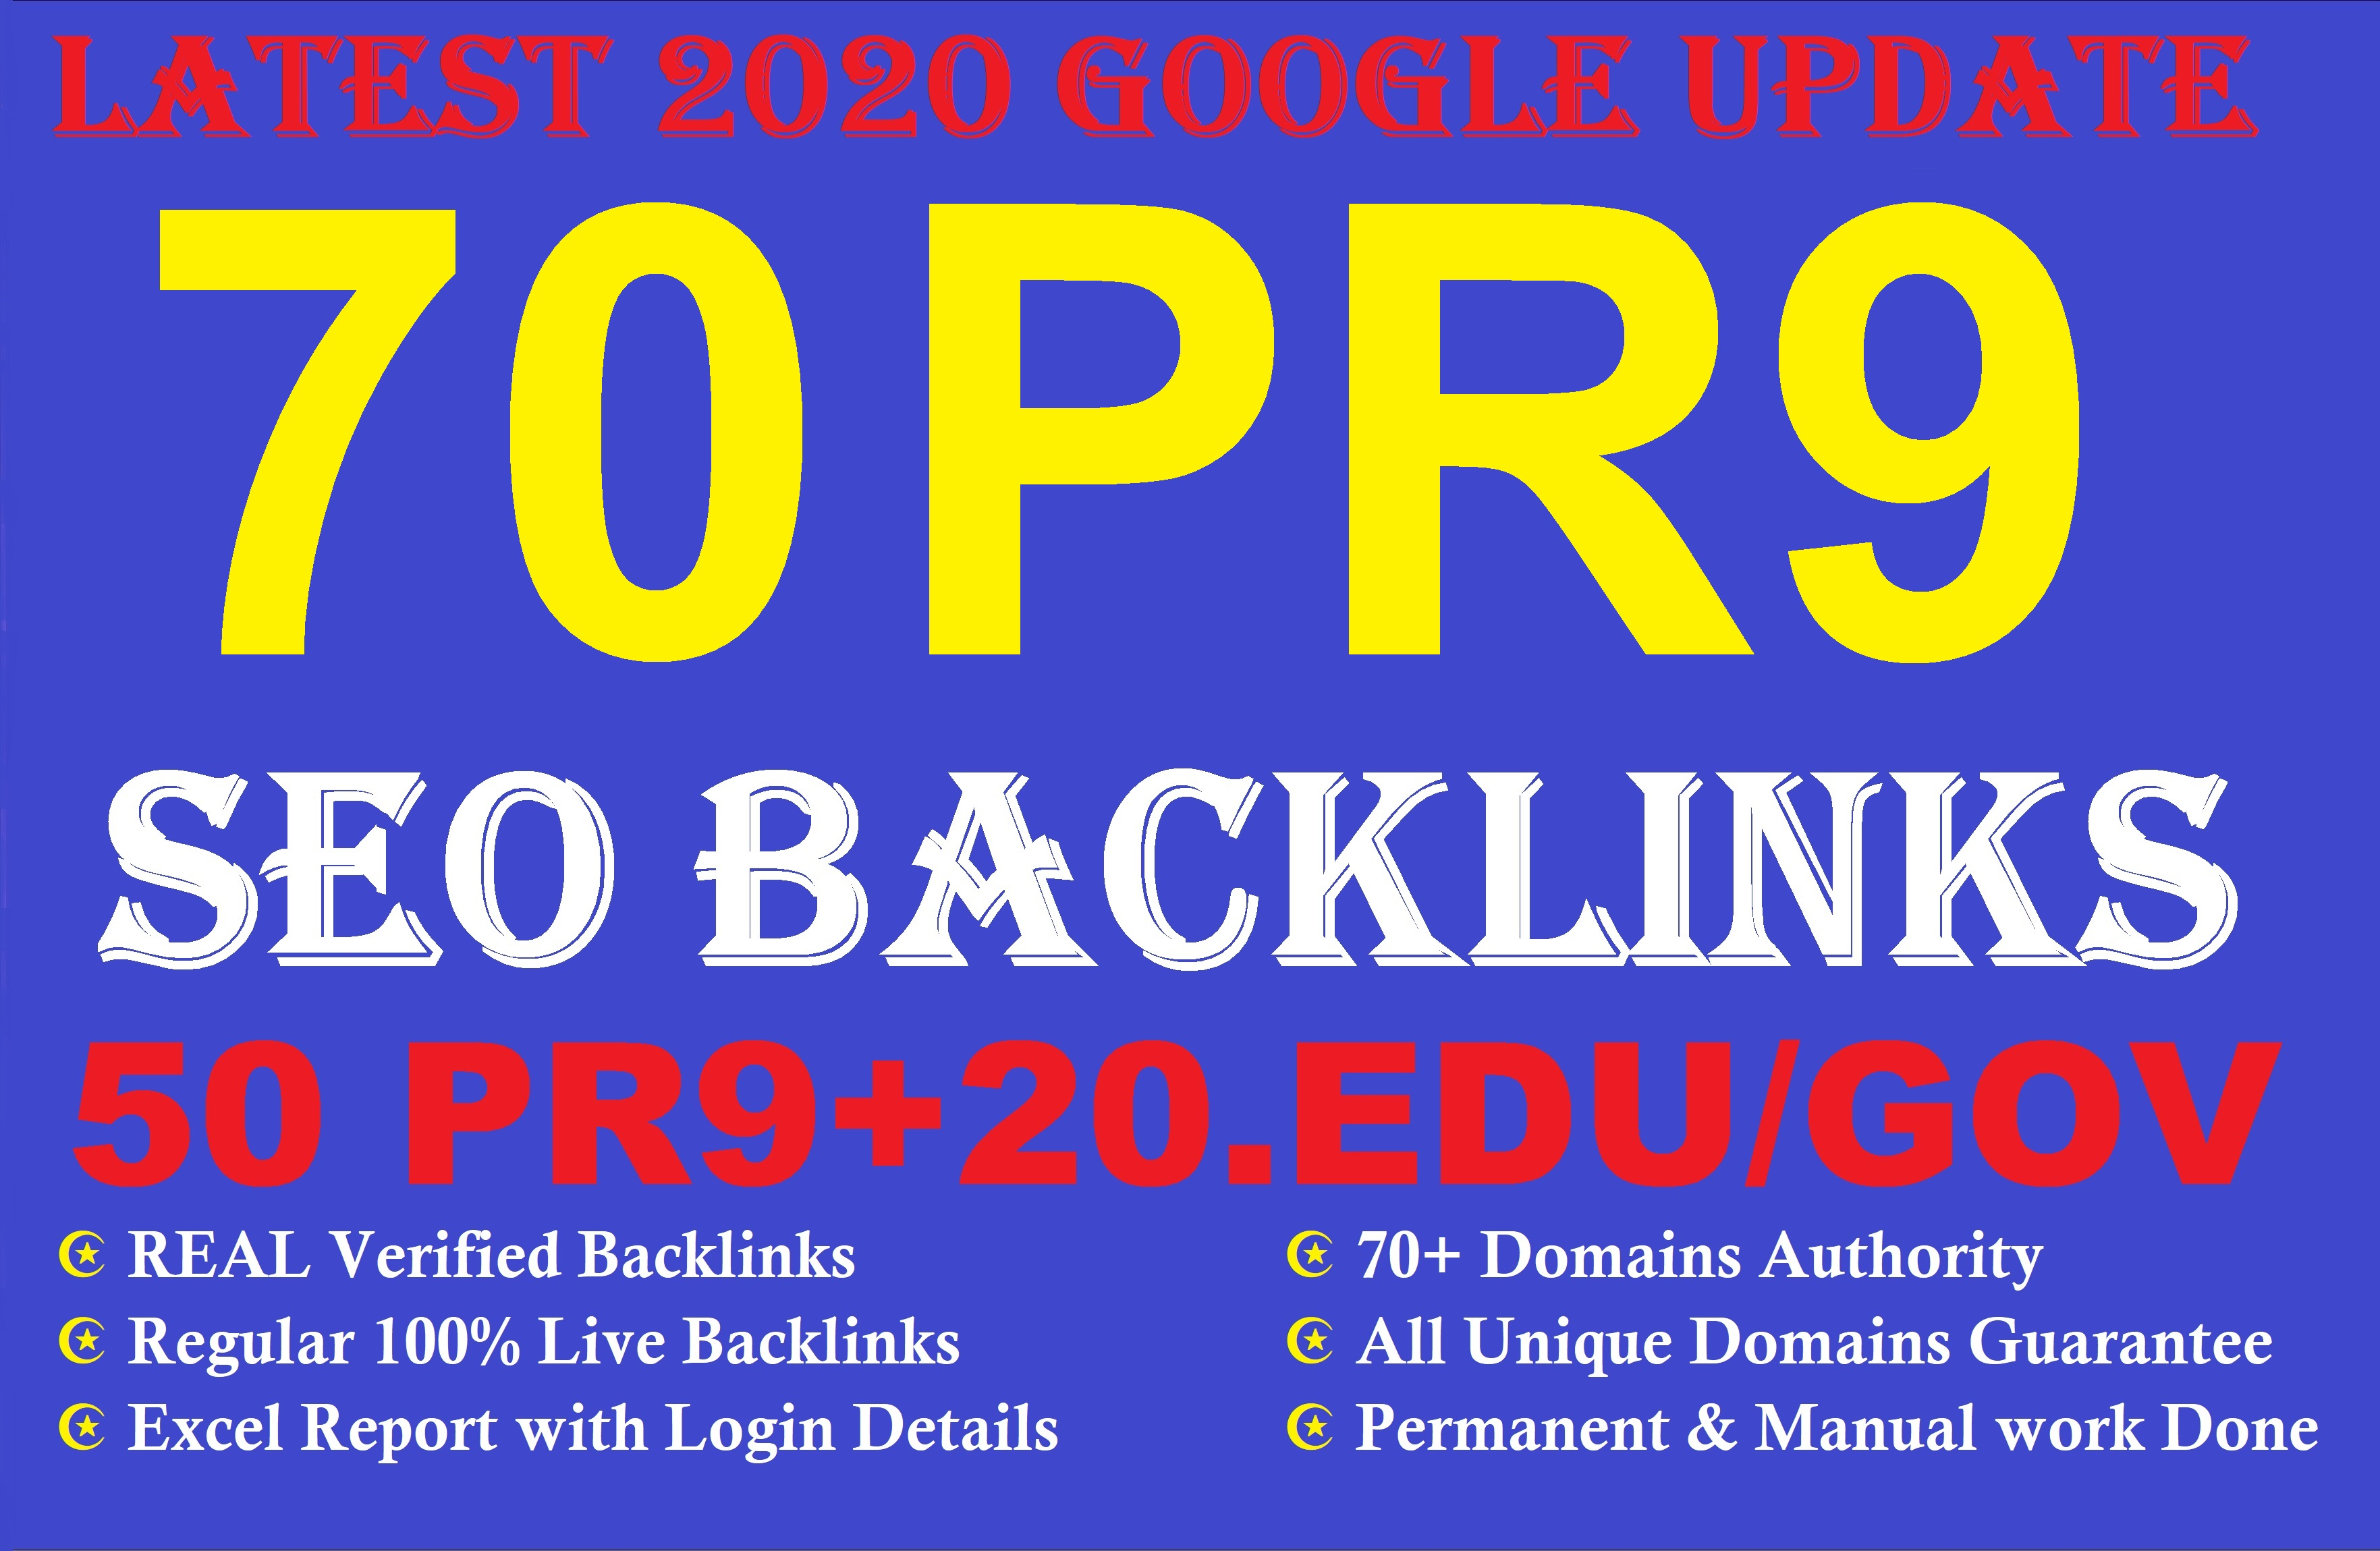 70 PR9 Backlinks 50 PR9+20 EDU/GOV Safe SEO High DA Backlinks Latest 2020 UPDATE